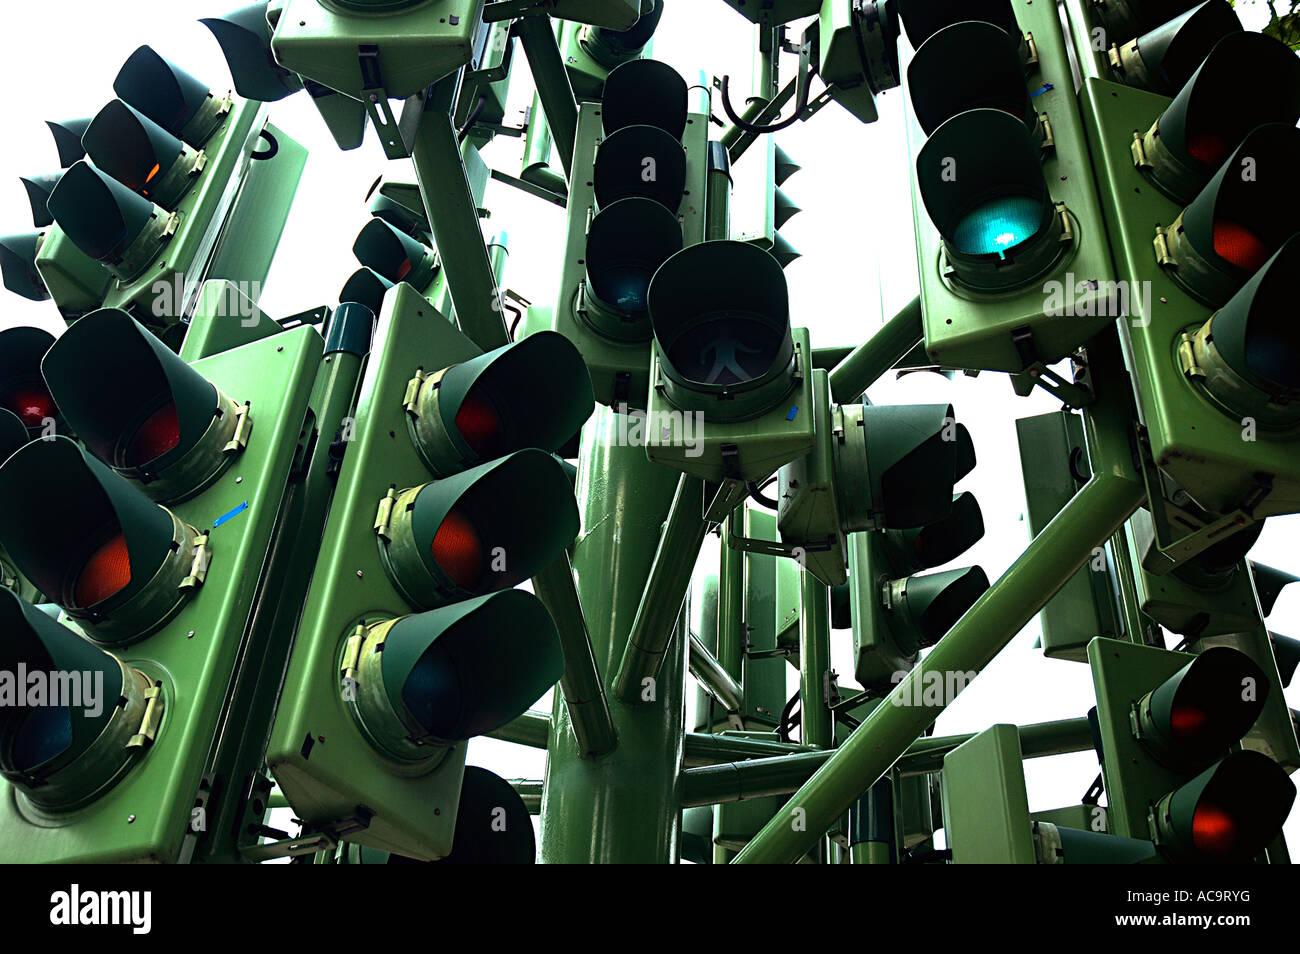 The Traffic Light Tree, Pierre Vivant 1998. - Stock Image